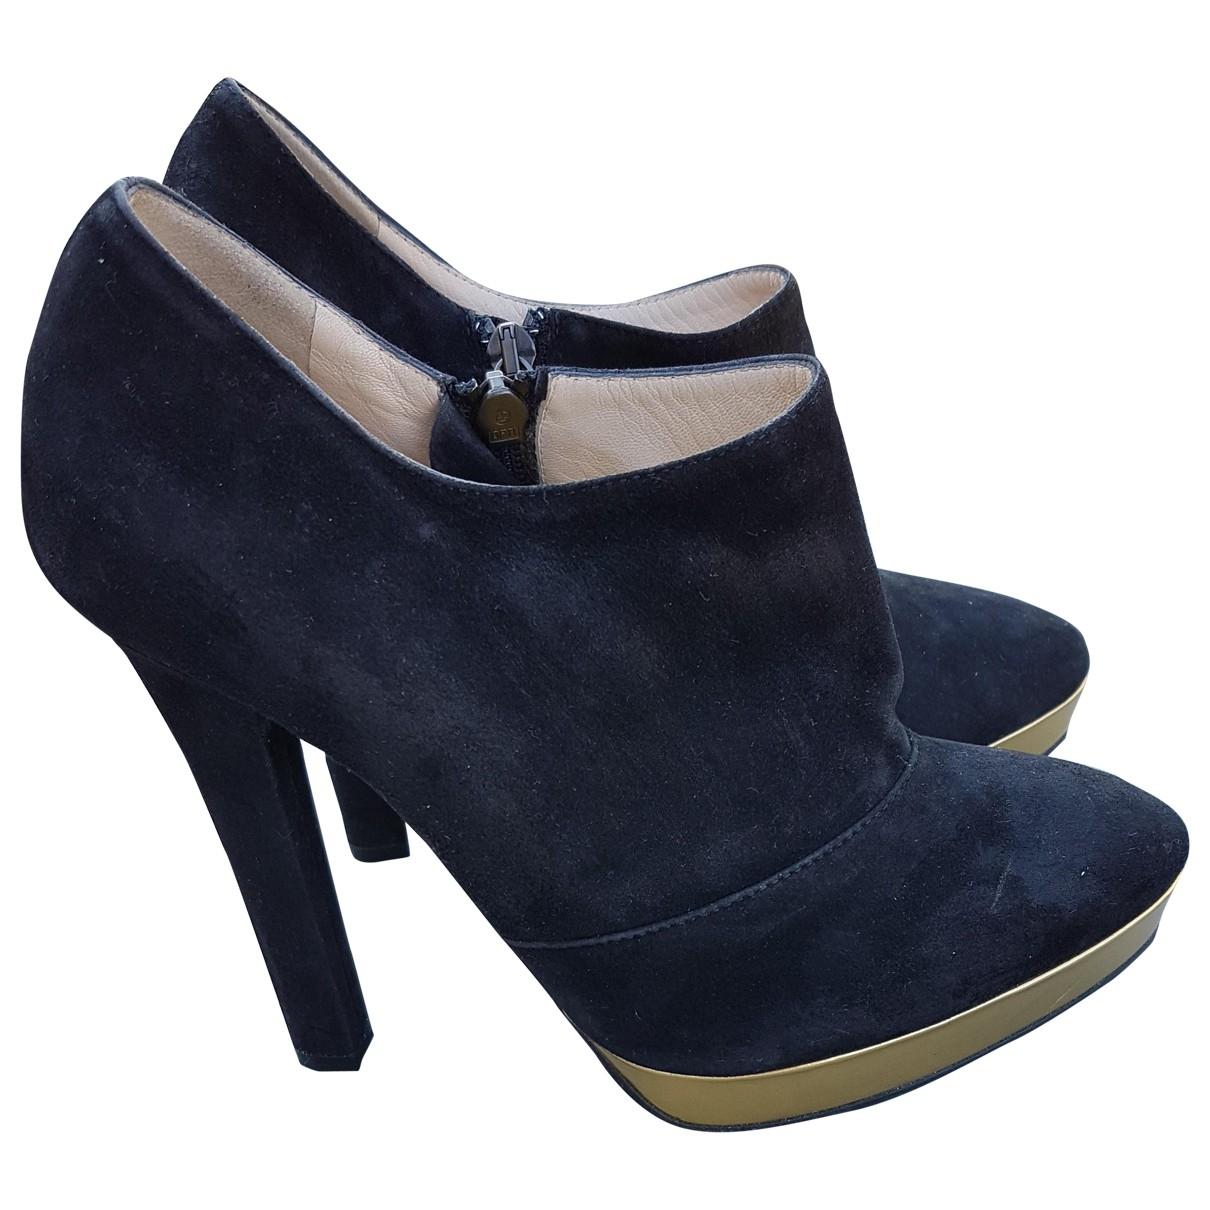 Bottega Veneta \N Black Leather Ankle boots for Women 38.5 EU